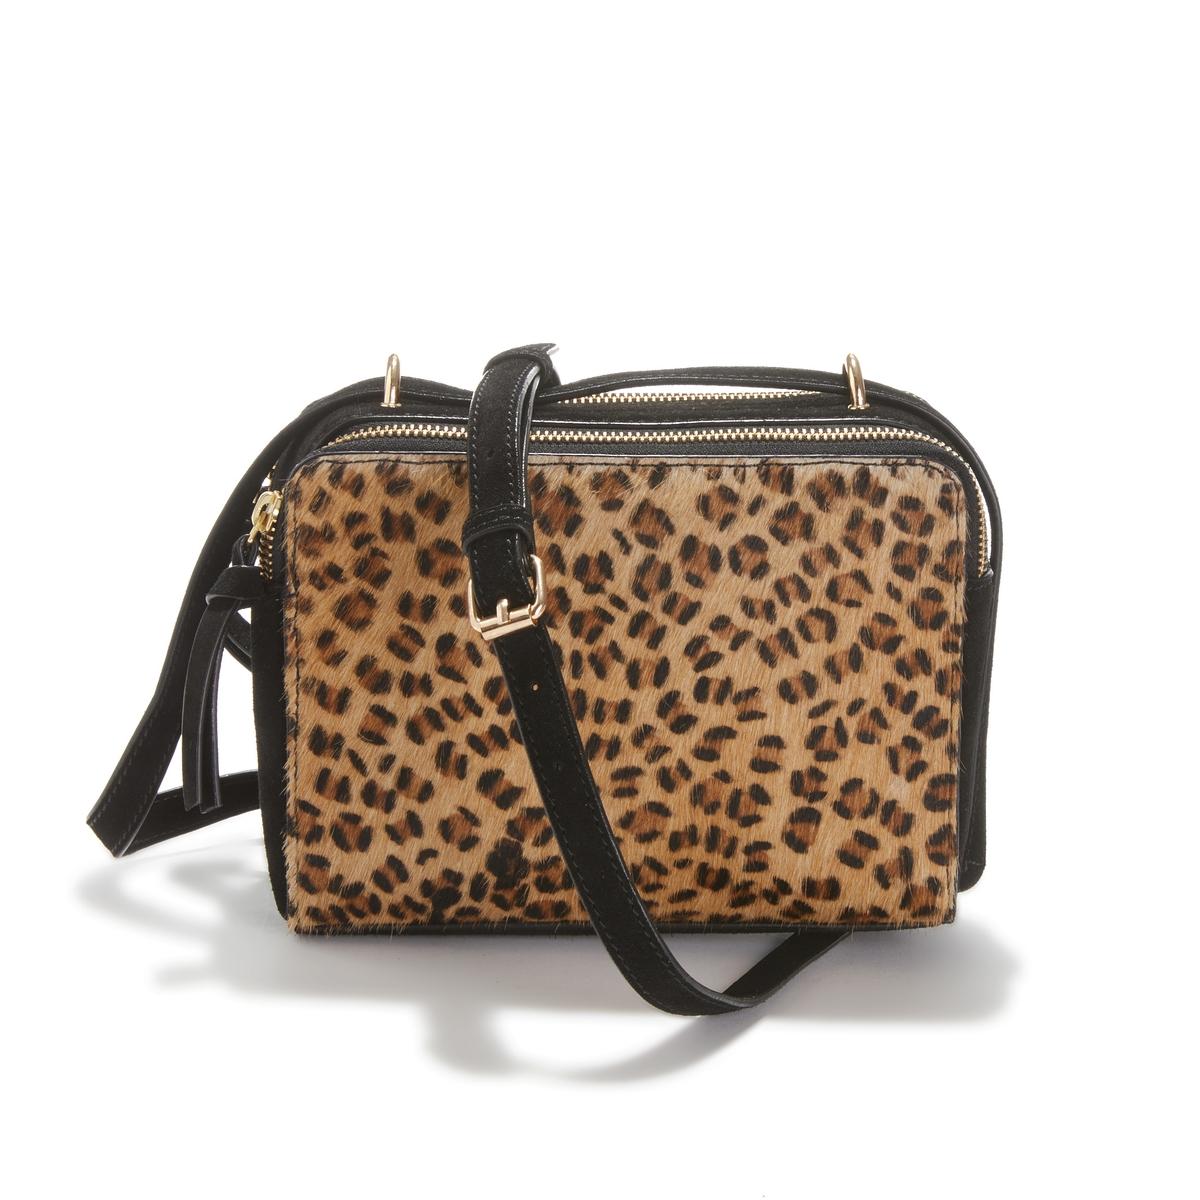 Bolso rígido de piel con motivo estilo leopardo